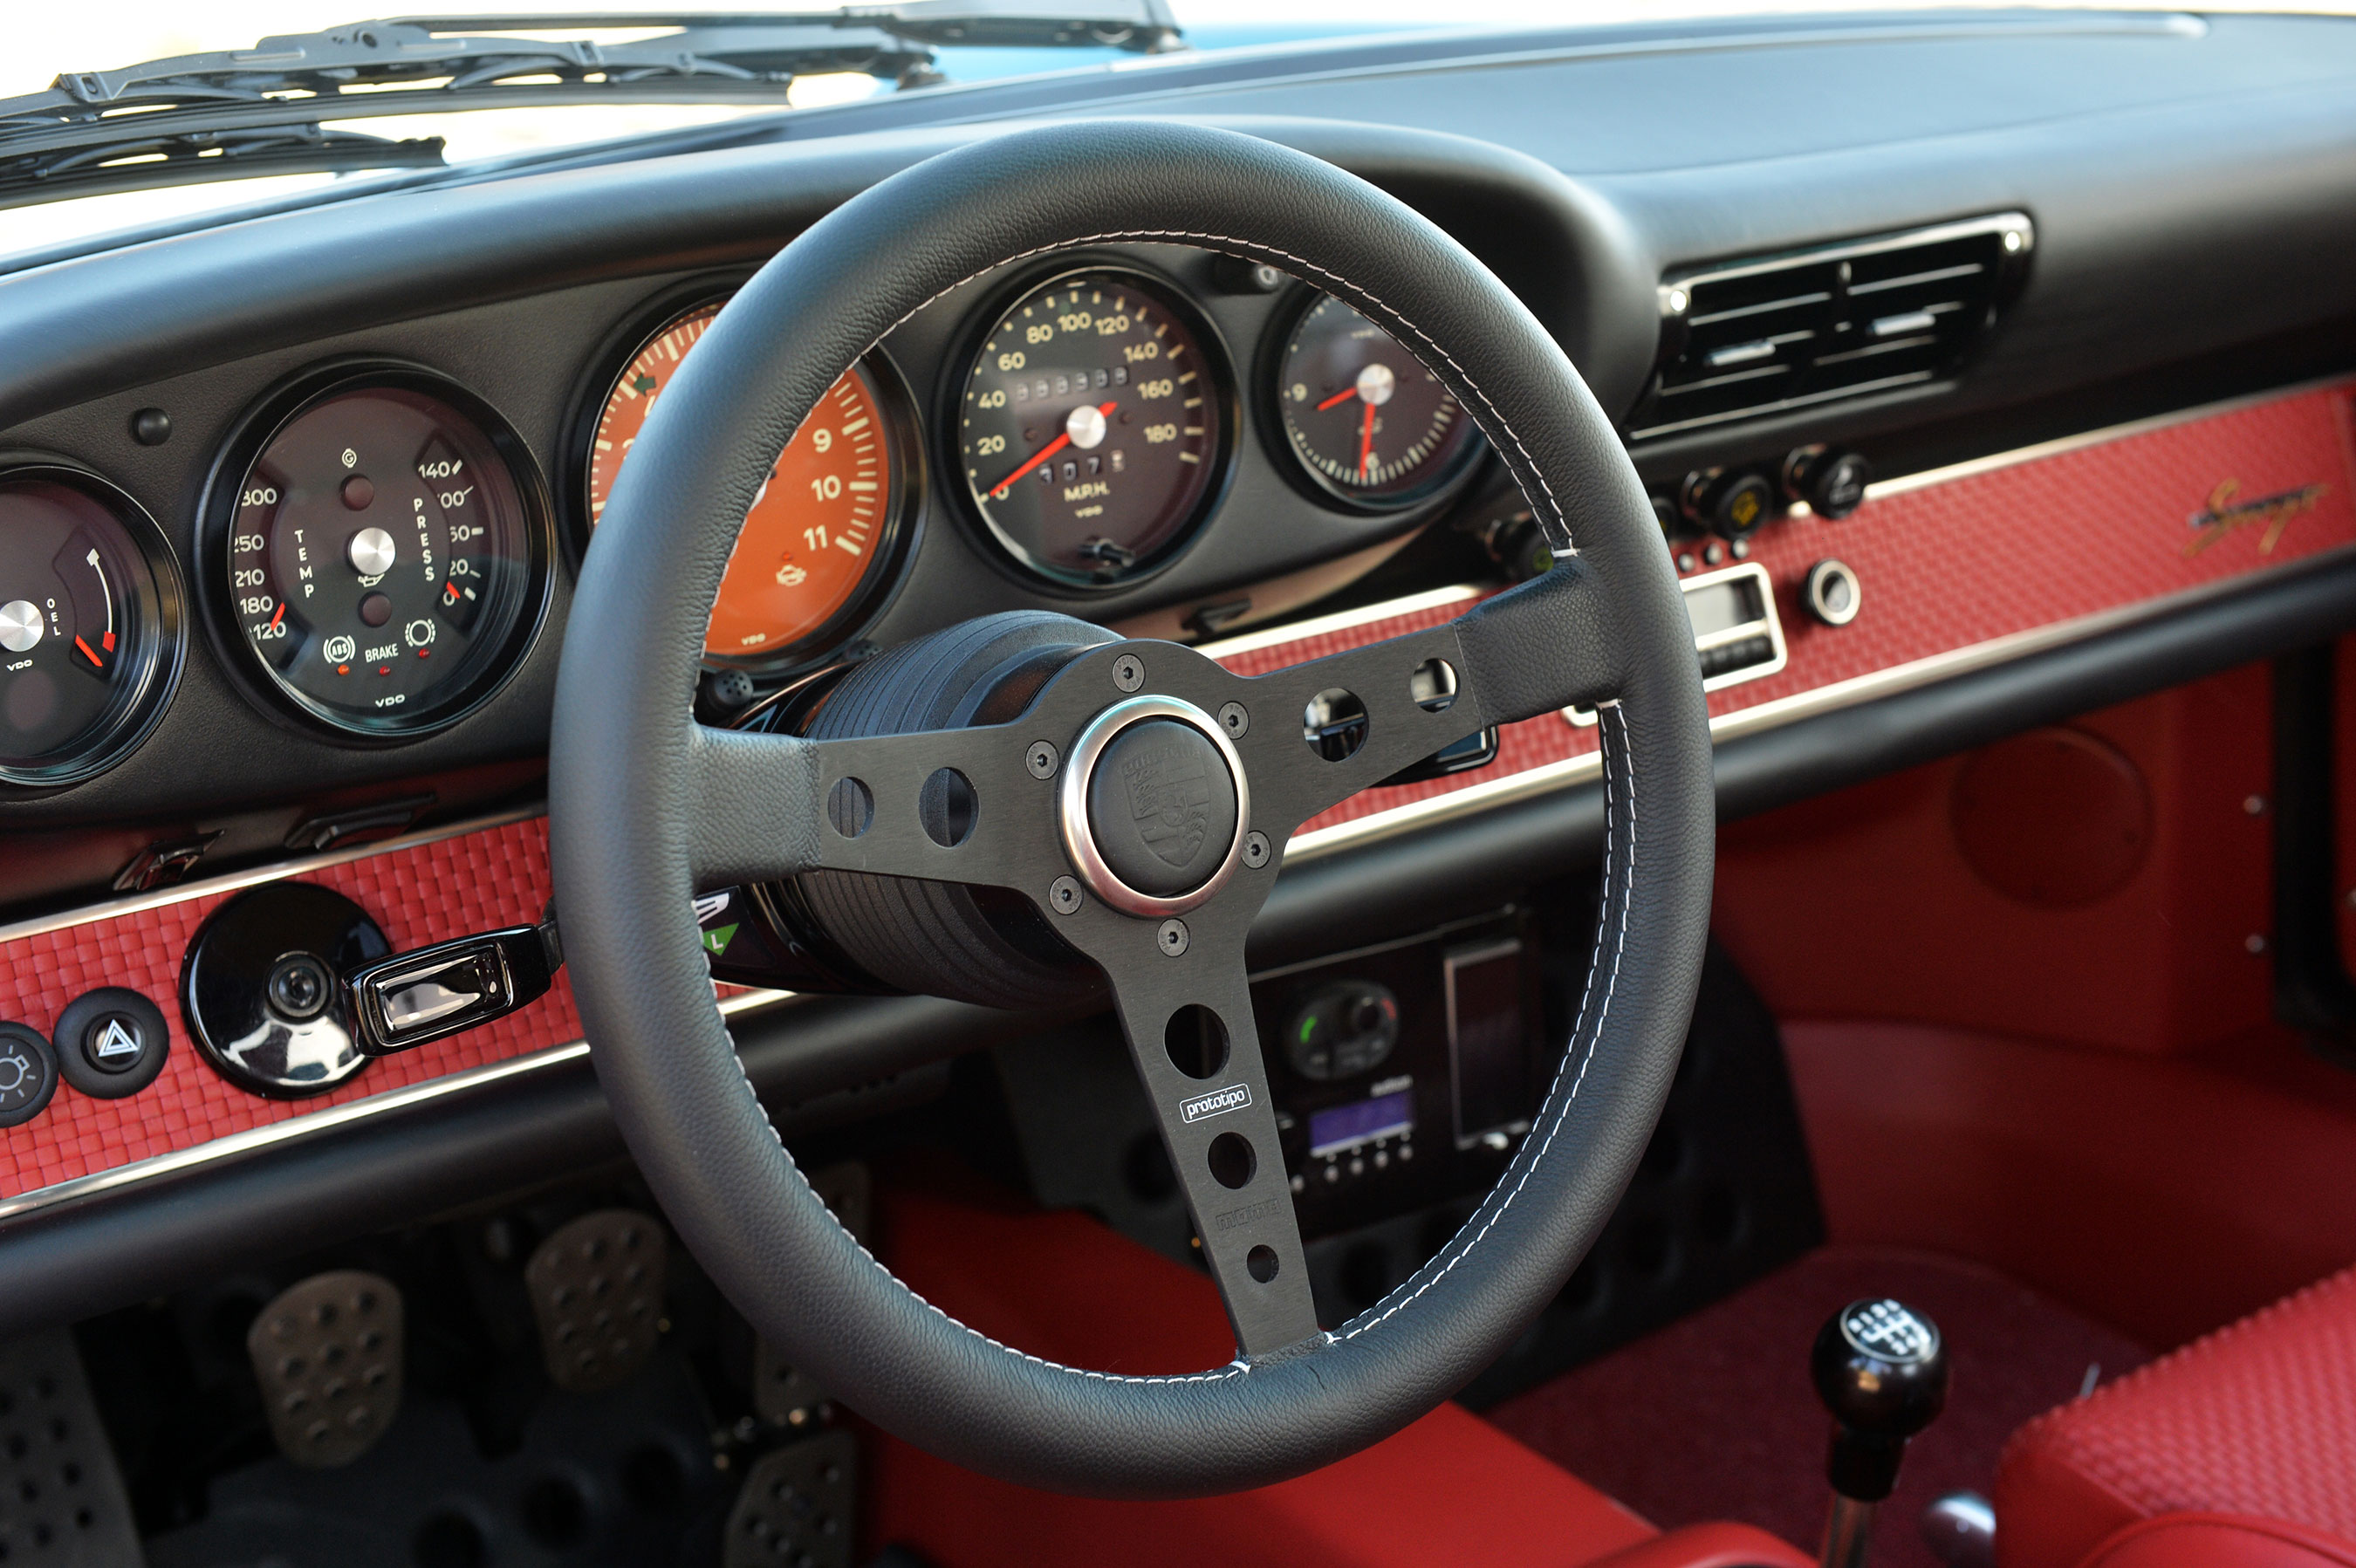 http://www.multivu.com/players/English/7294051-singer-vehicle-design-extreme-montery-car-week-new-luxurious-spor ...